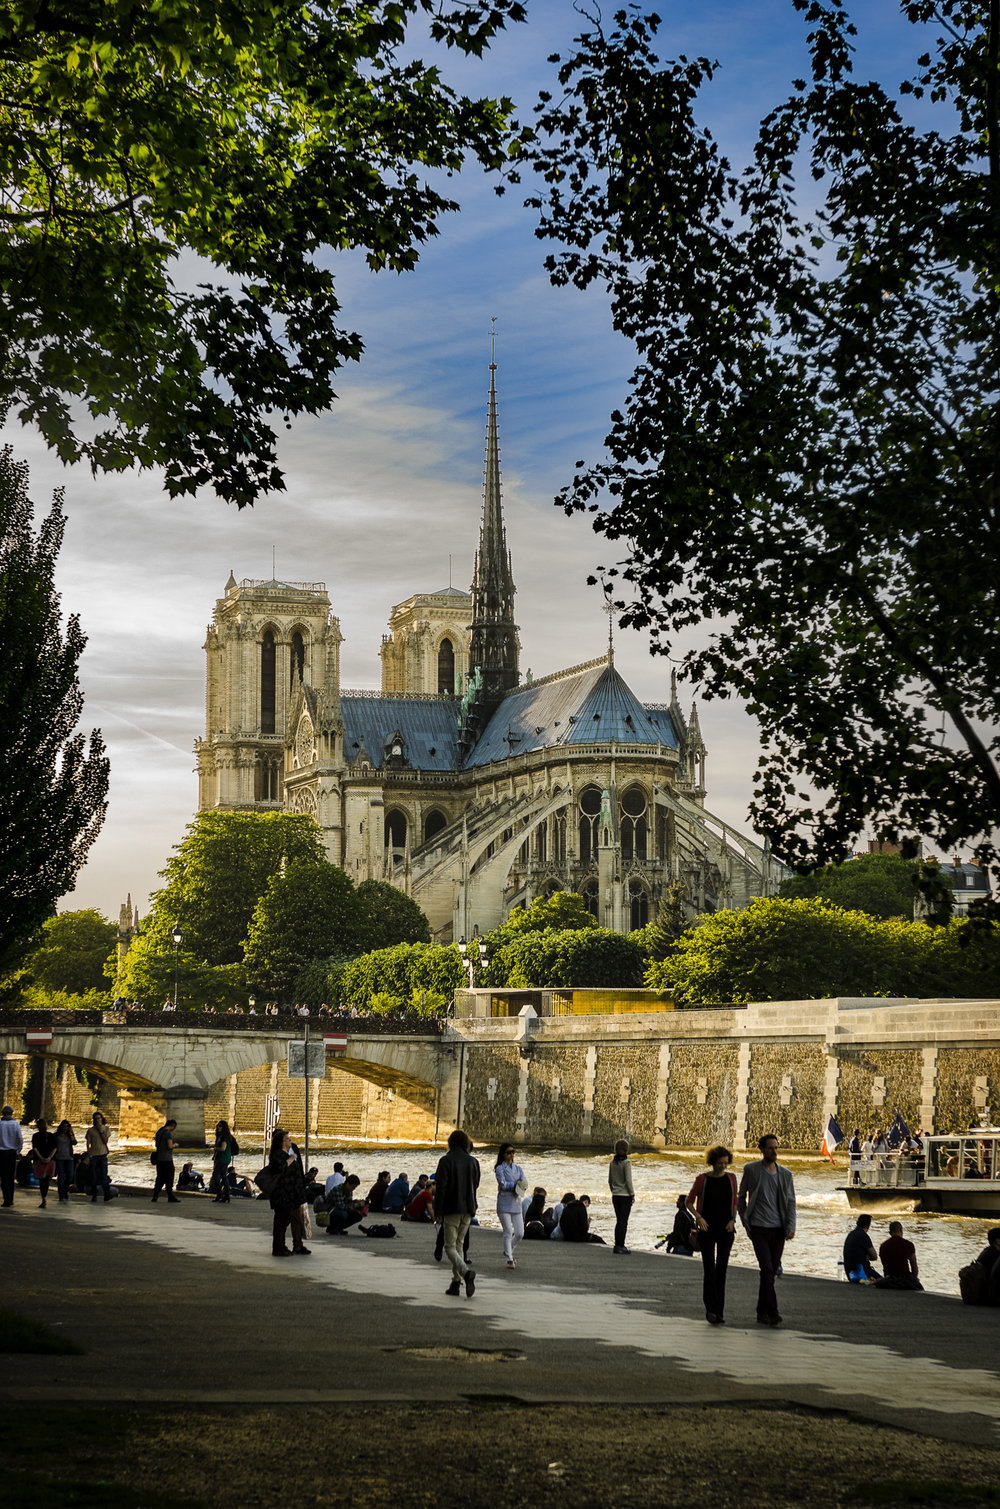 Quai de la Tournelle -   Quayside  PHOTOGRAPHY : ALEXANDER J.E. BRADLEY •Nikon D7000 • AF-S NIKKOR 24-70mm F/2.8G ED • 48MM • F/4.5 •1/320 •ISO 100